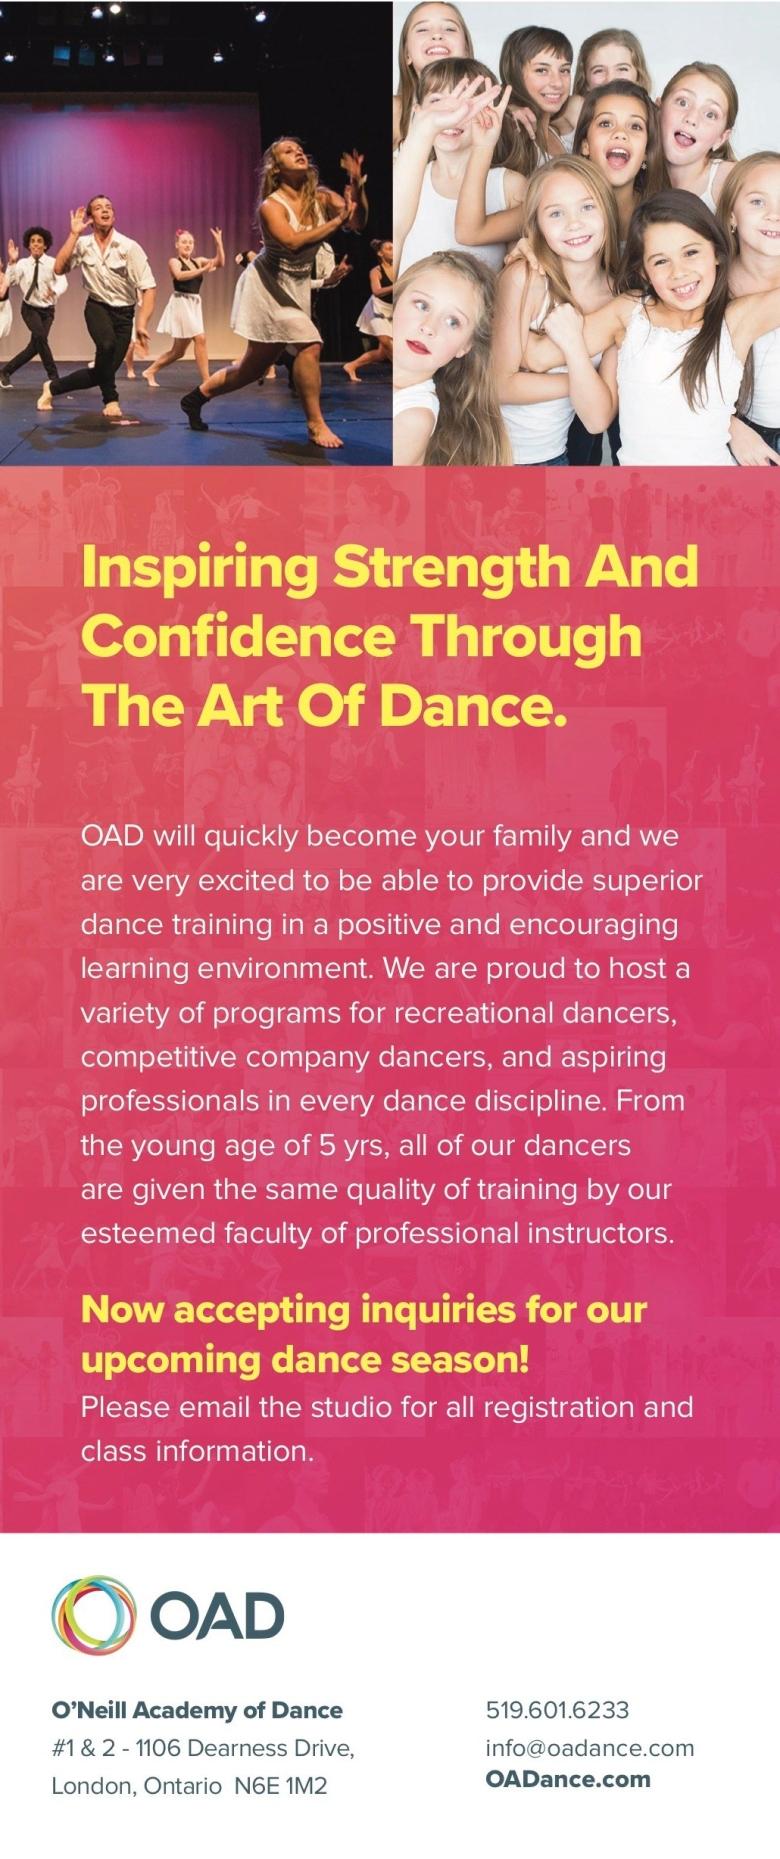 oad-advertisement-e1558999752119.jpg